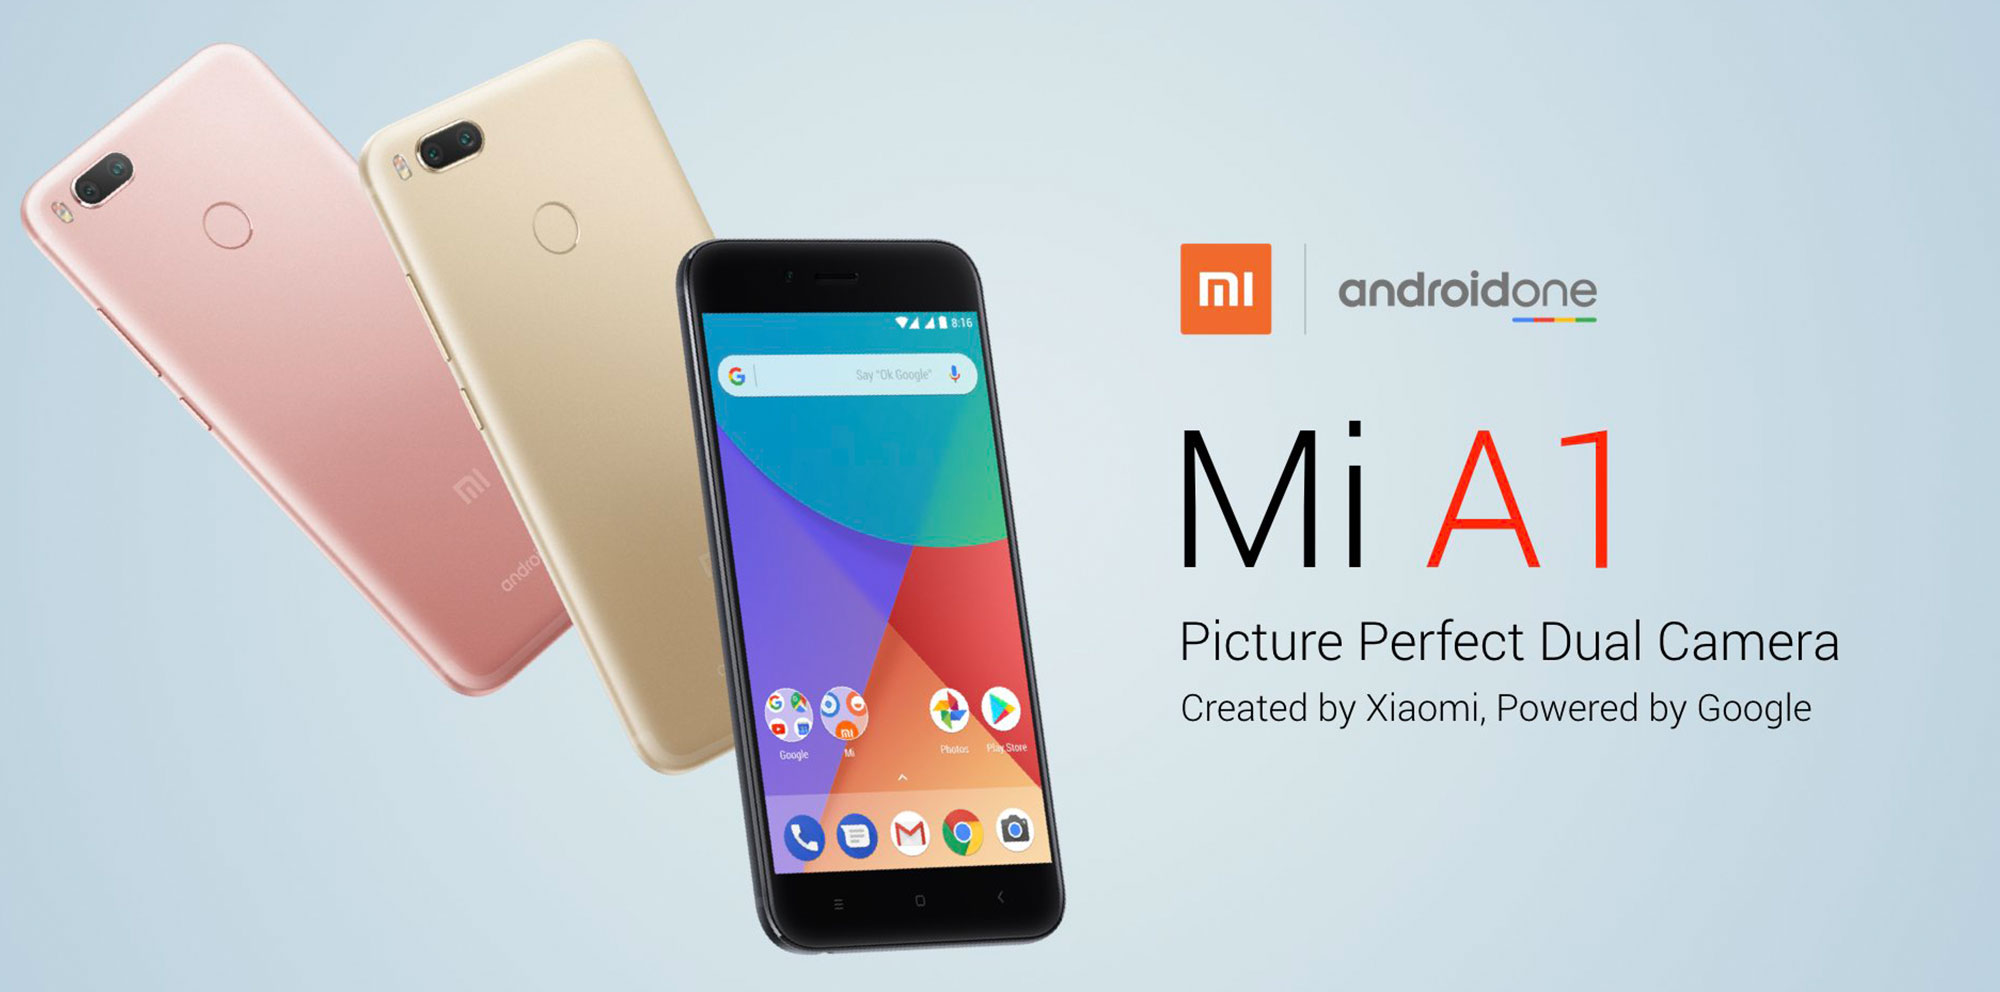 új okostelefon: Xiaomi Mi A1